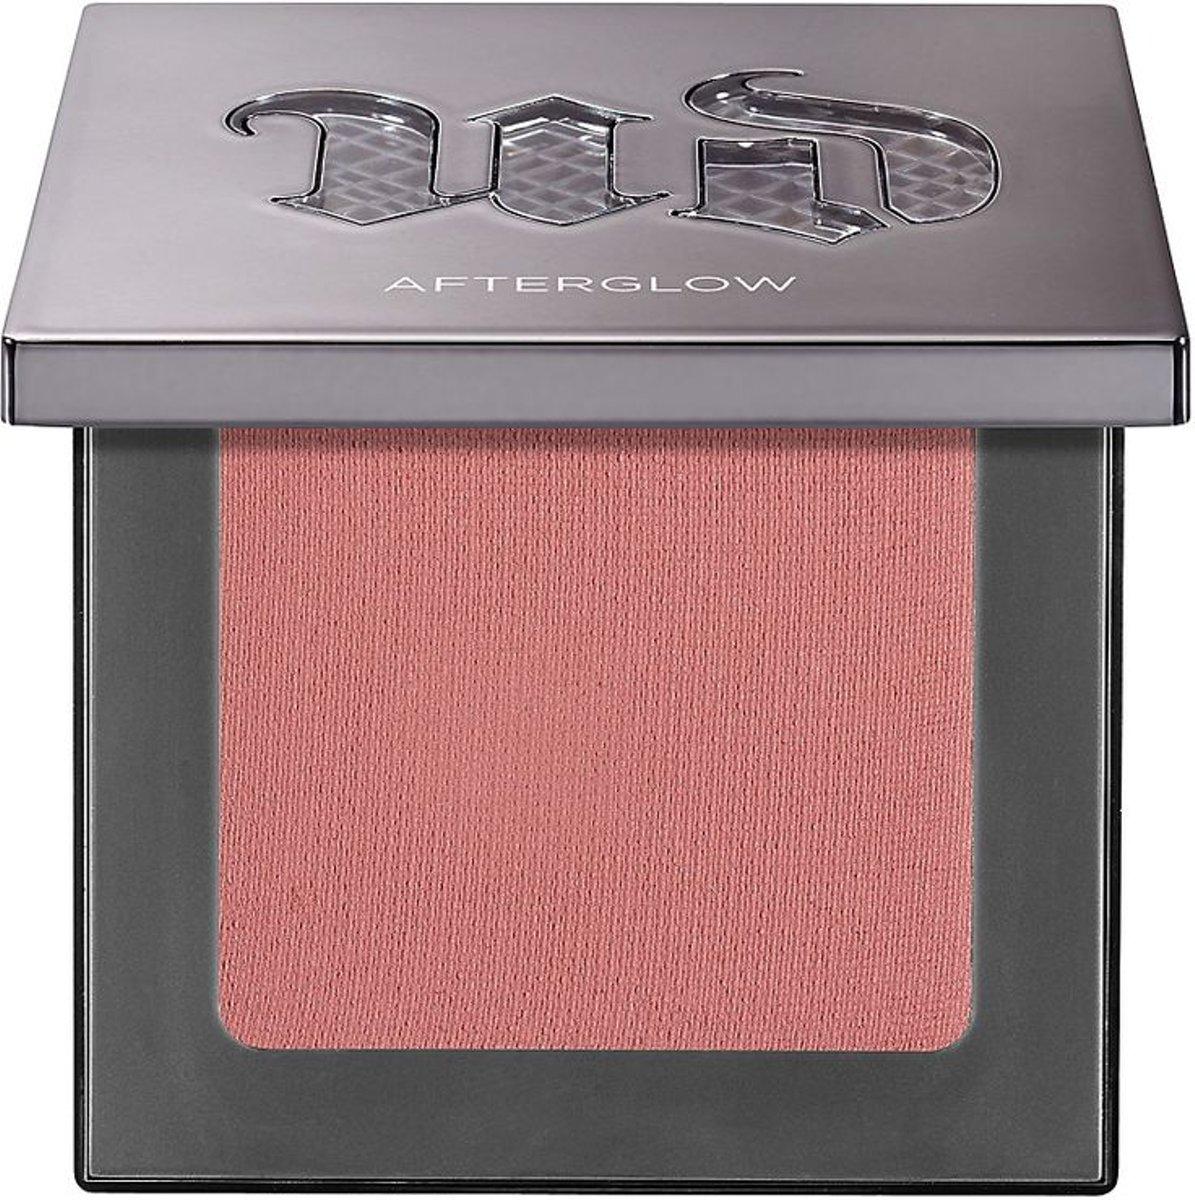 c108bdcadeffc9ae1d6639a828150756--urban-decay-blush-makeup-blush